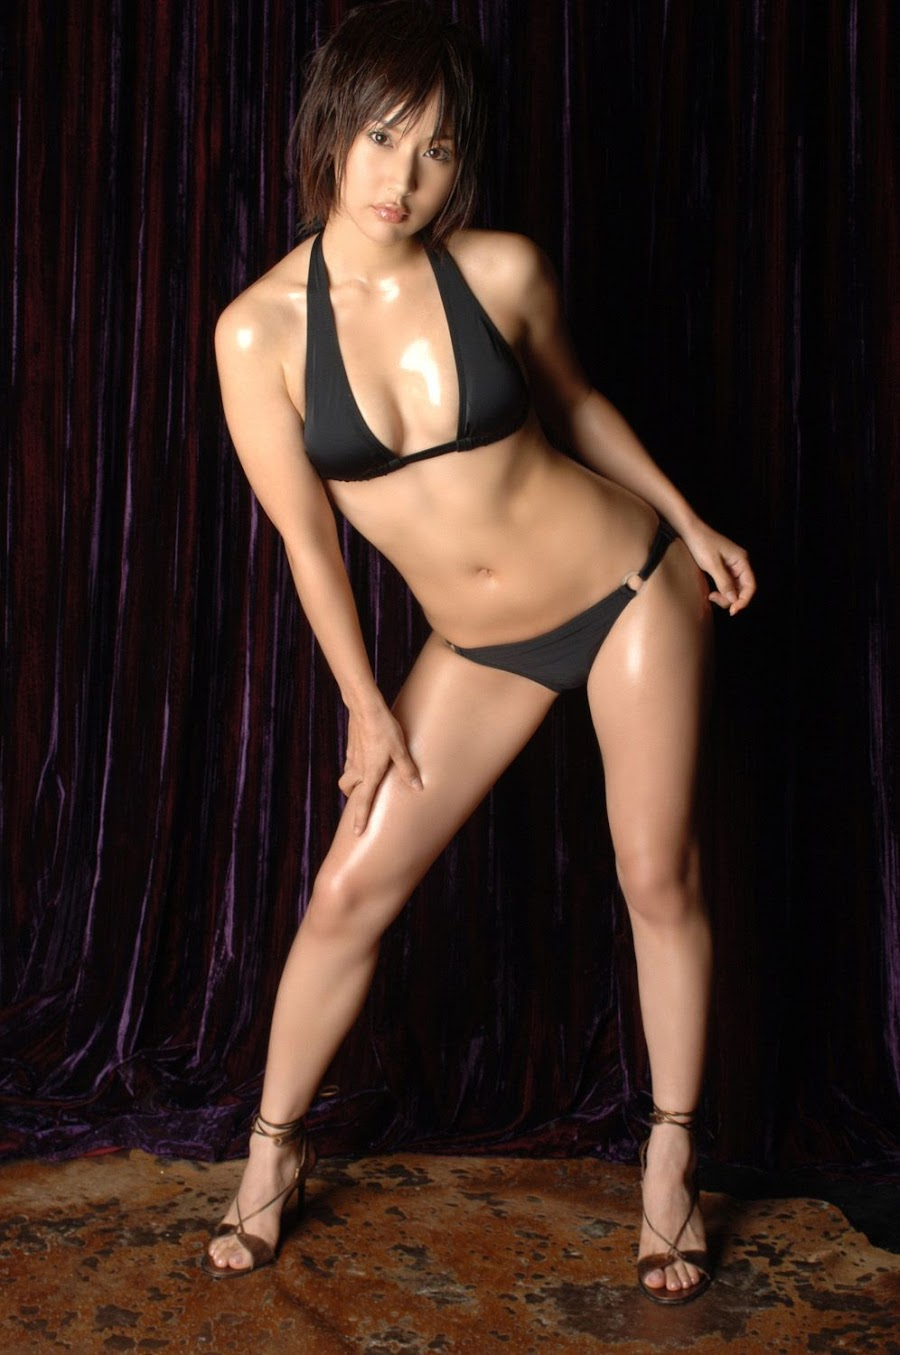 Misato Hirata - sexy Japanese gravure idol and actress